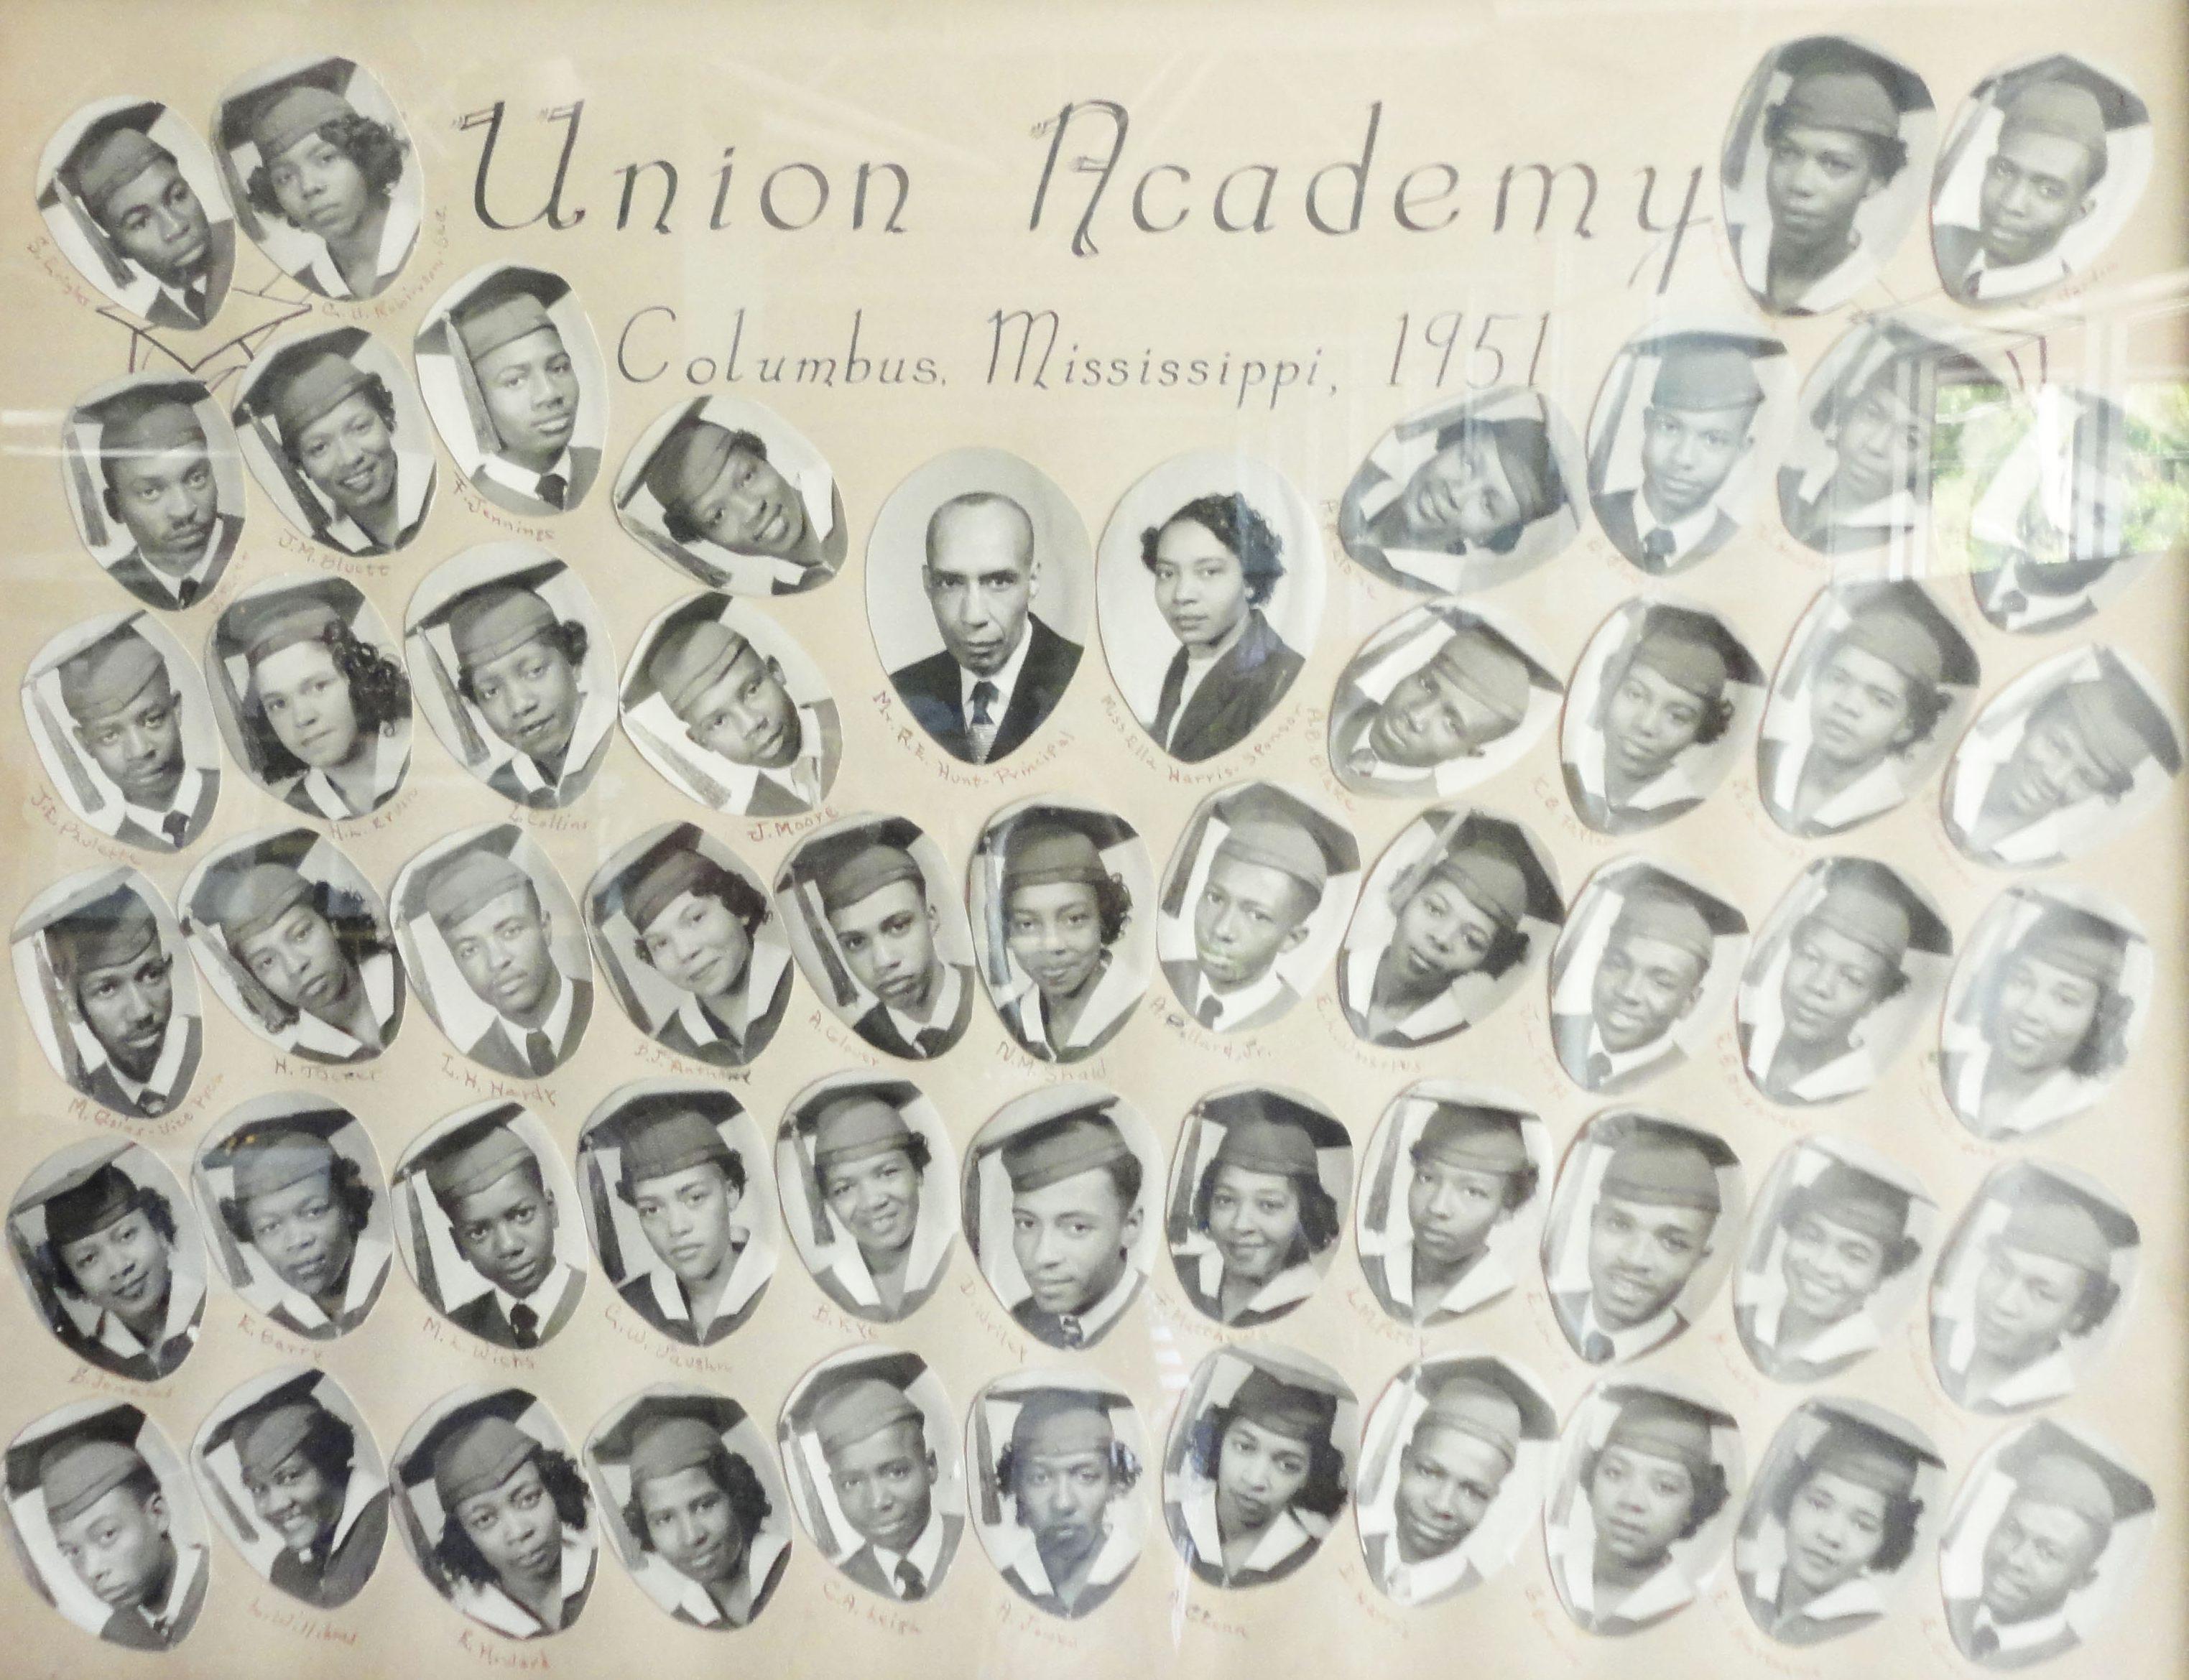 UA Class 1951